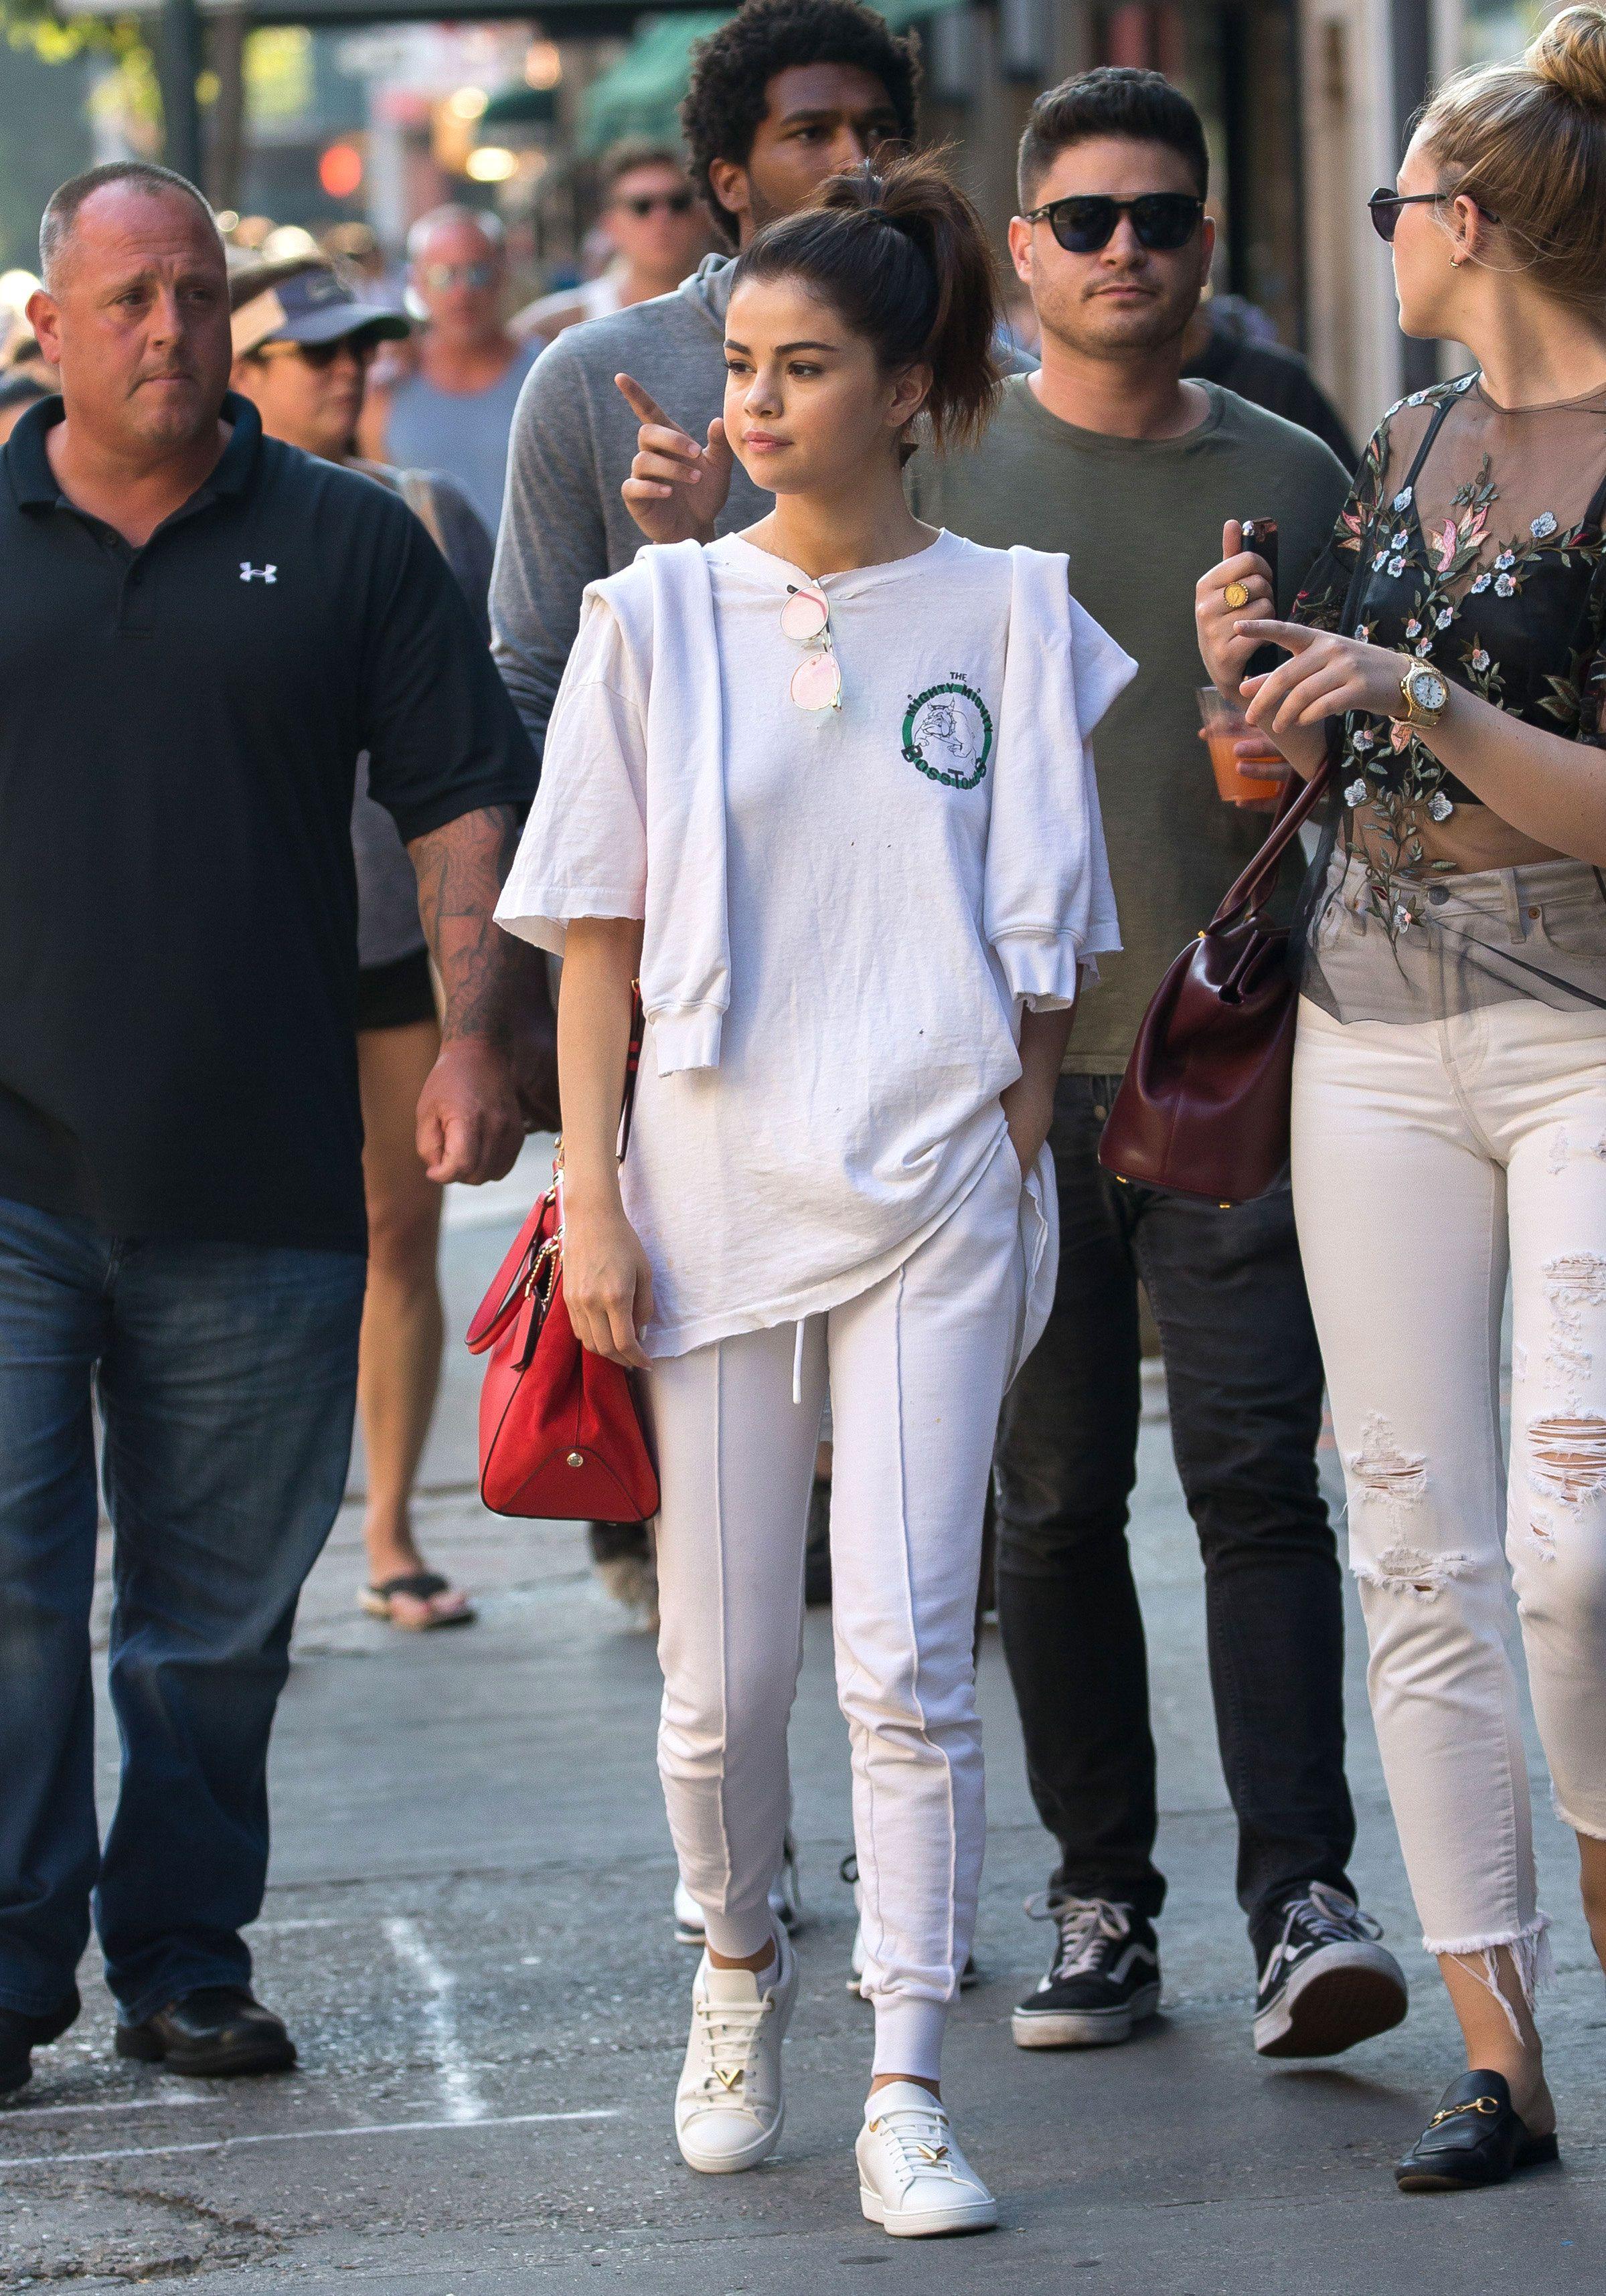 Selena Gomez Spent a Low-Key Weekend in Boston With Her Friends